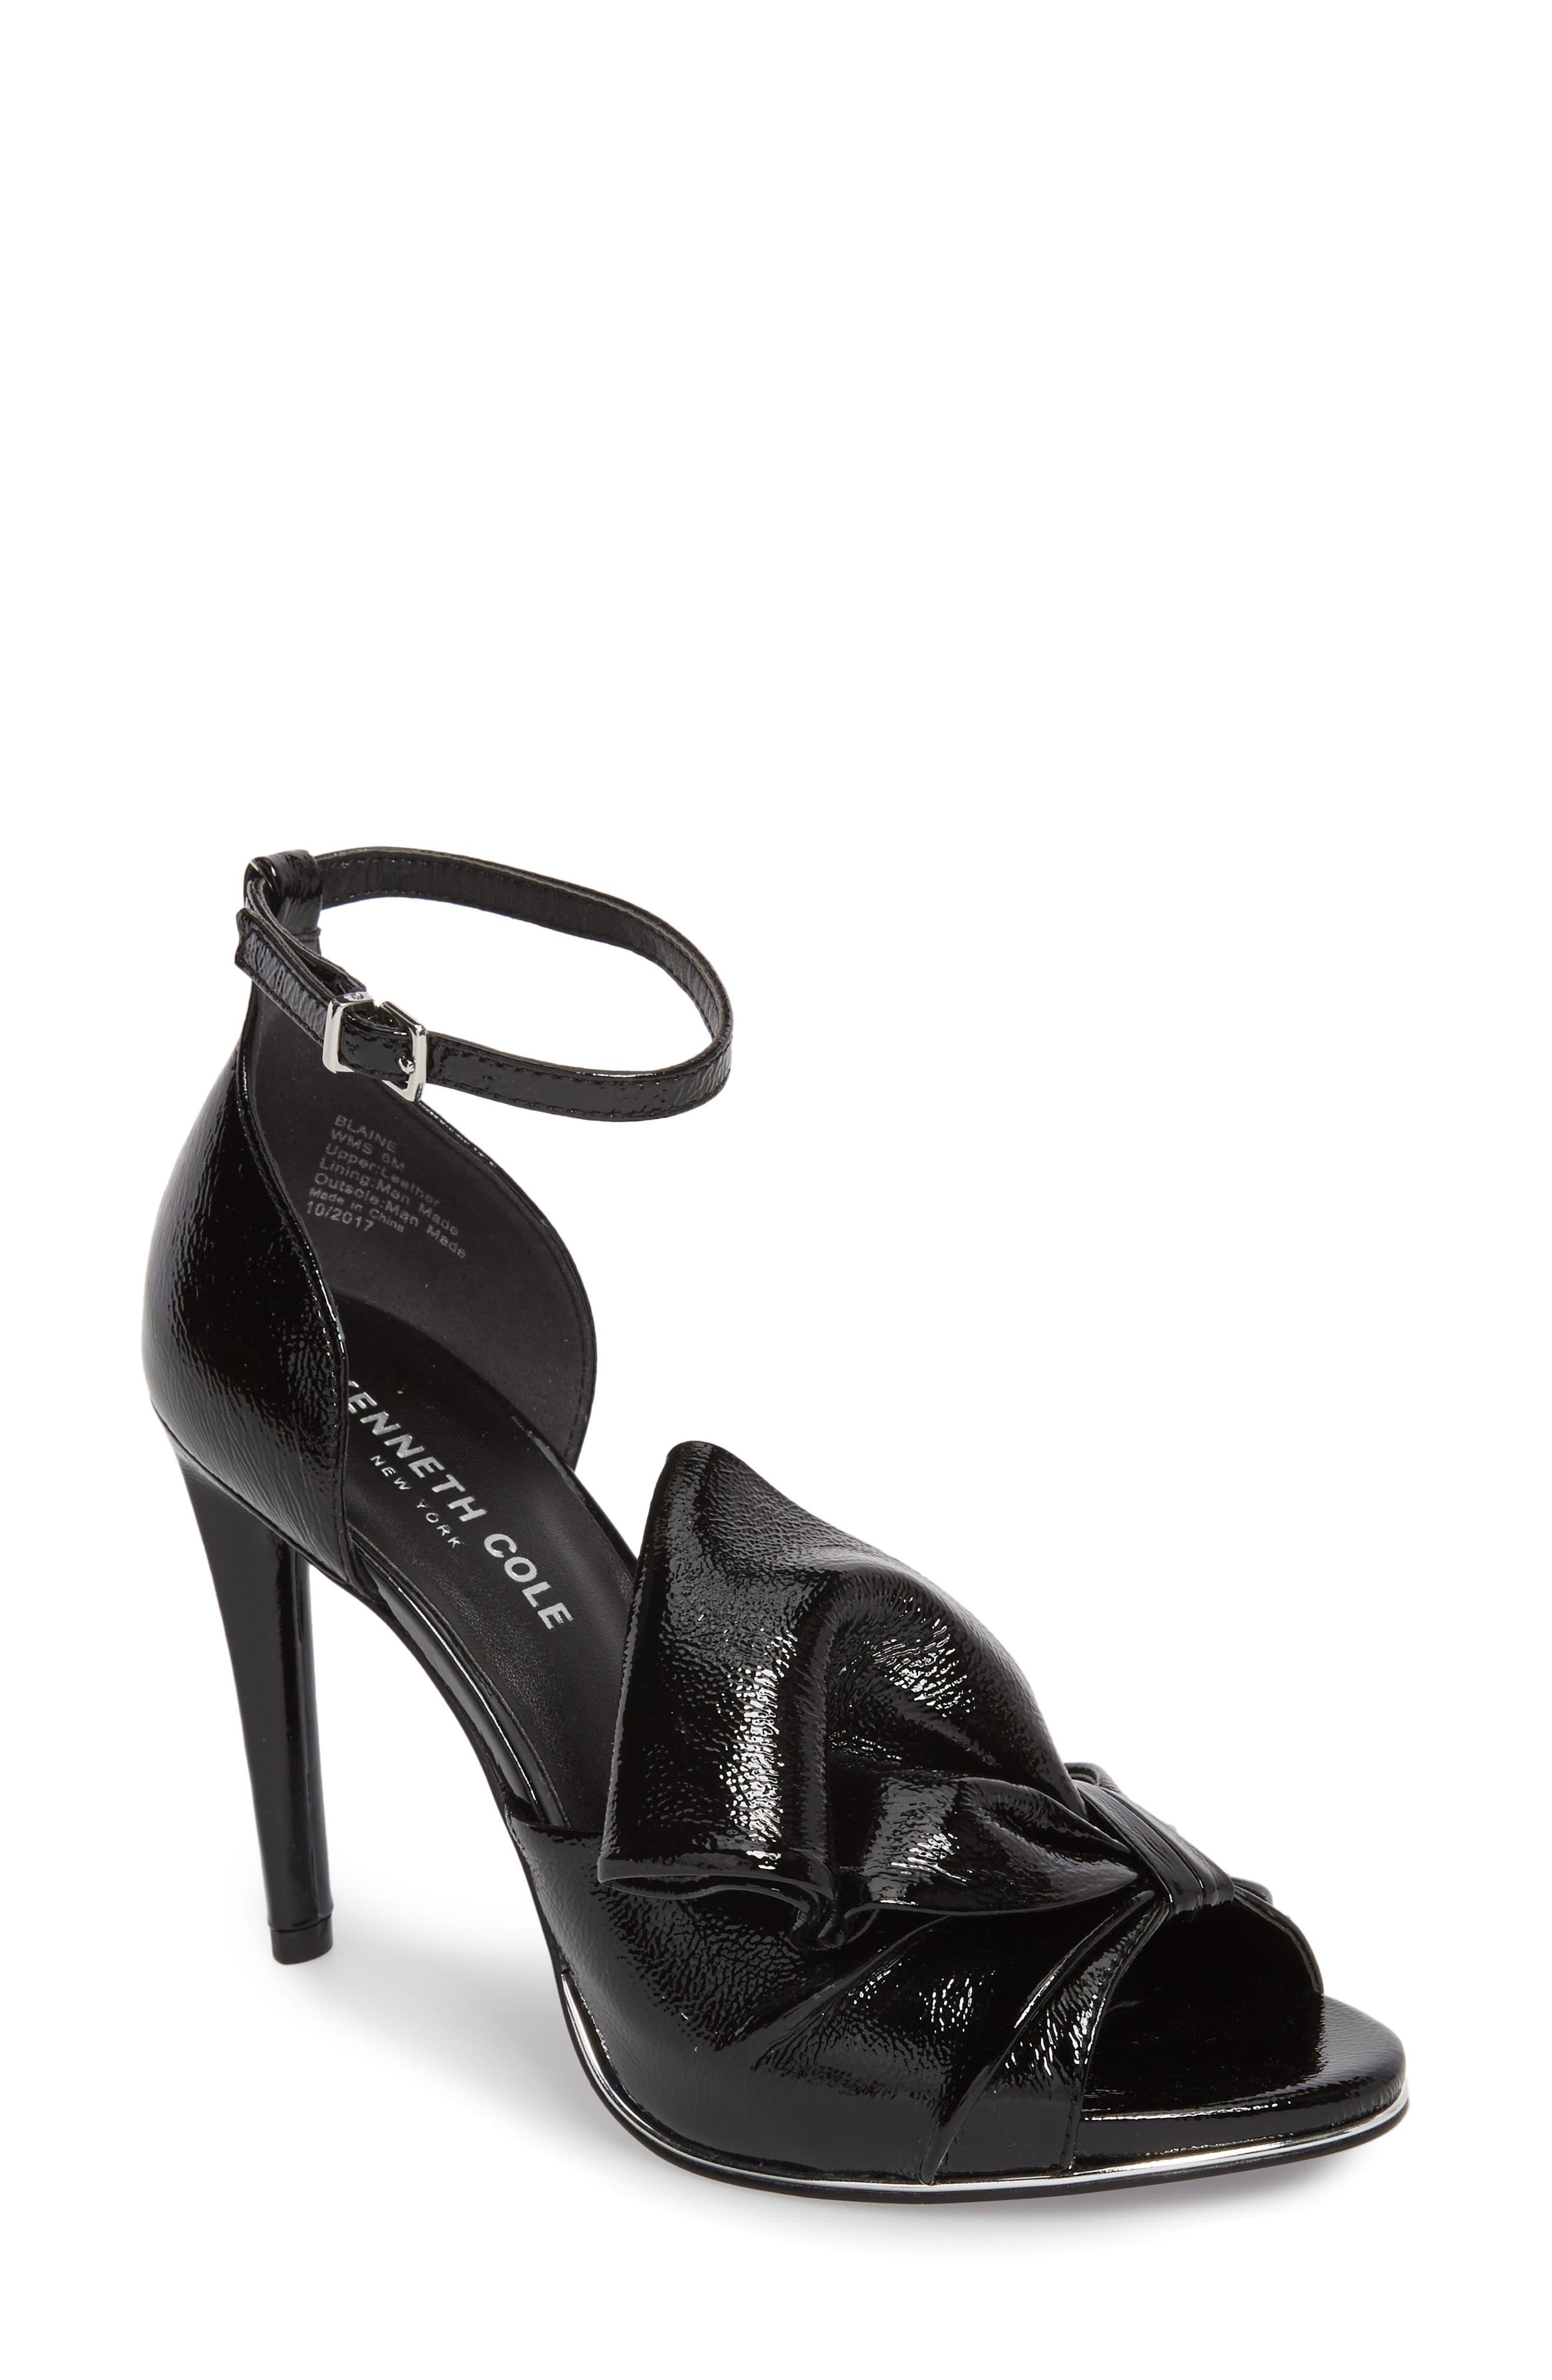 Alternate Image 1 Selected - Kenneth Cole New York Blaine Ankle Strap Sandal (Women)